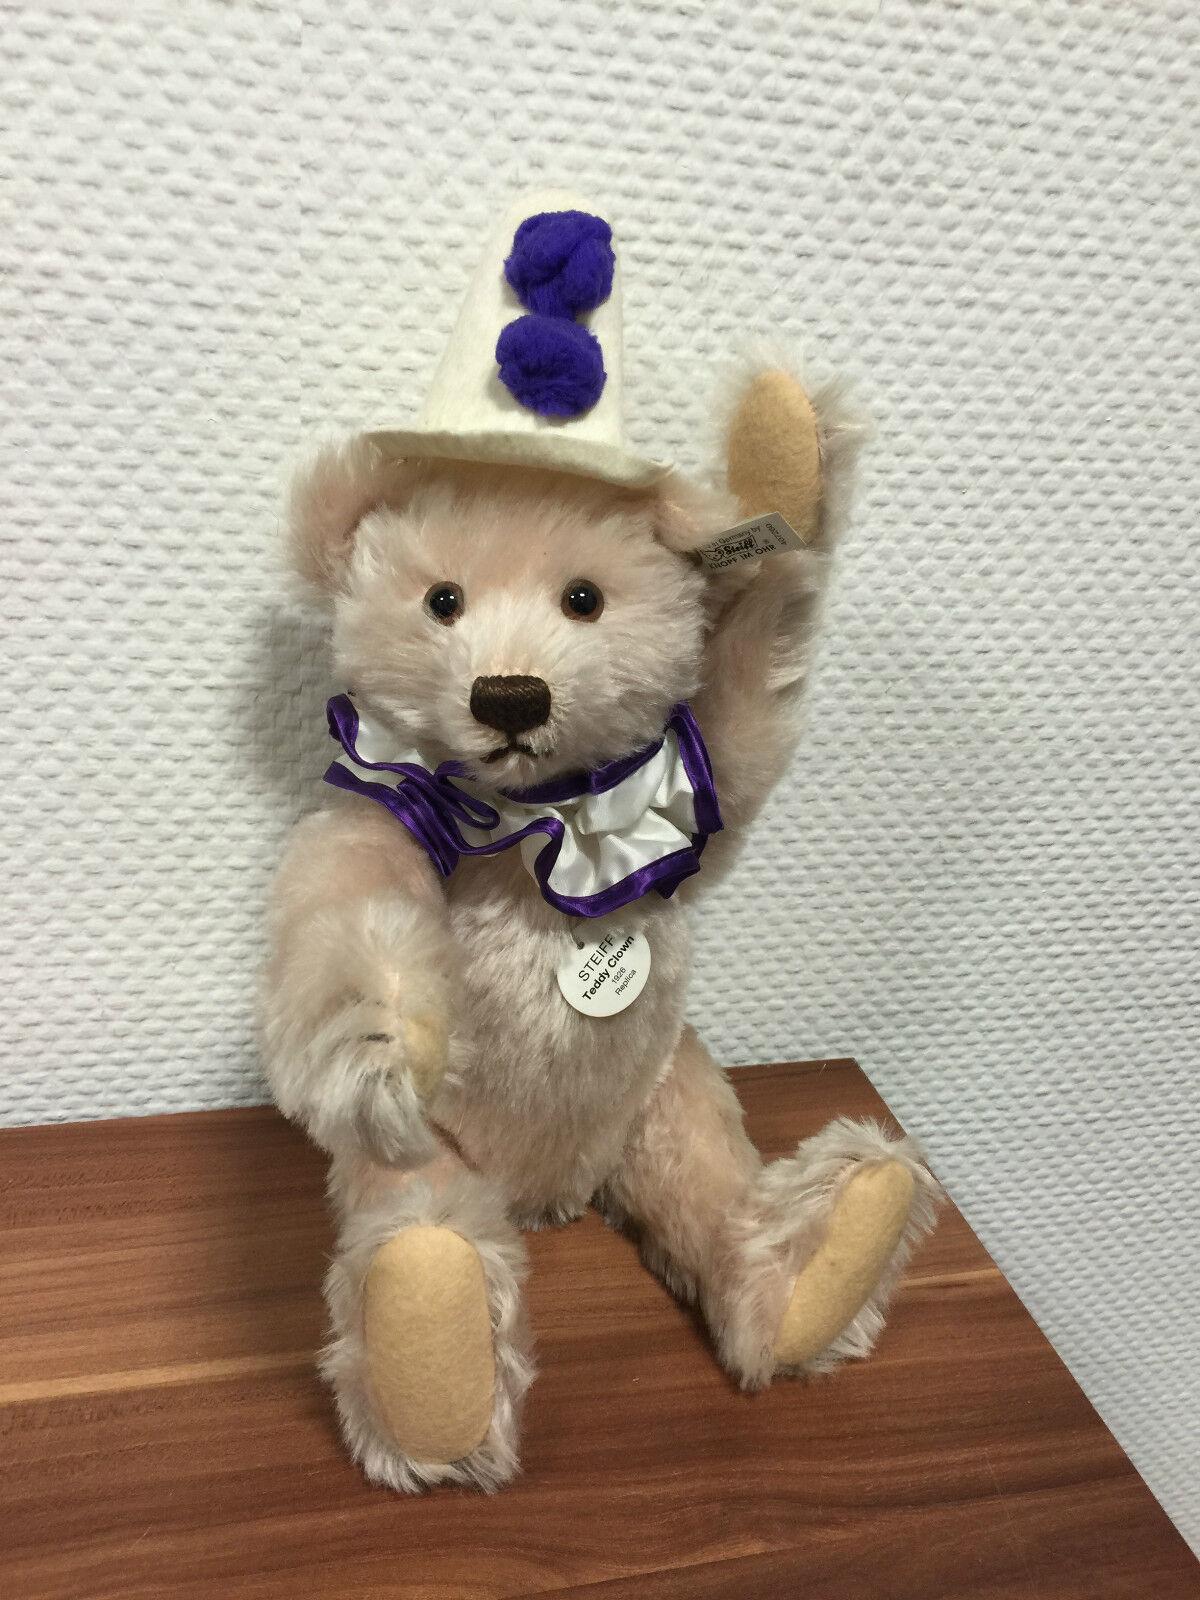 Steiff Teddy Bear 407260   Teddy Teddy Teddy Clown   33 Cm. Top Condition eaf